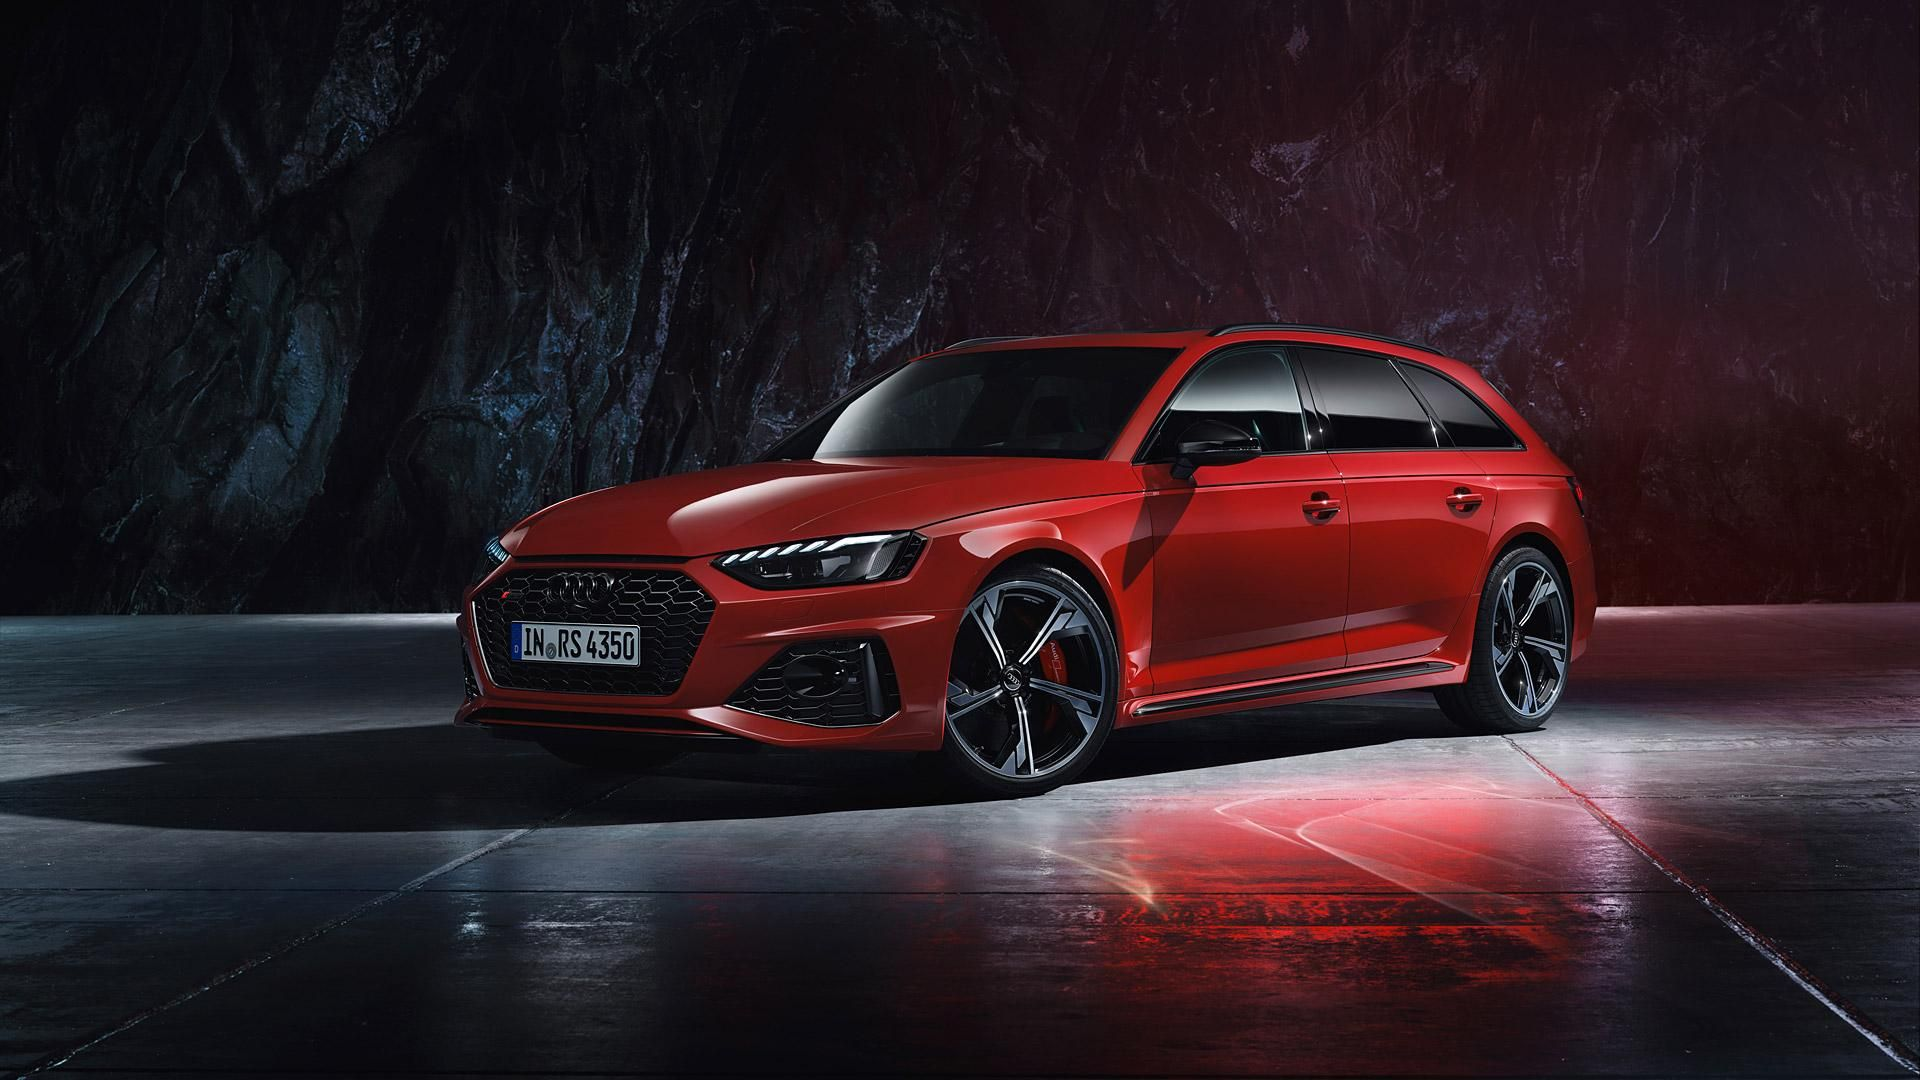 2020 Audi Rs4 Avant Wallpaper Audi Rs4 Avant Audi Rs4 Rs4 Avant